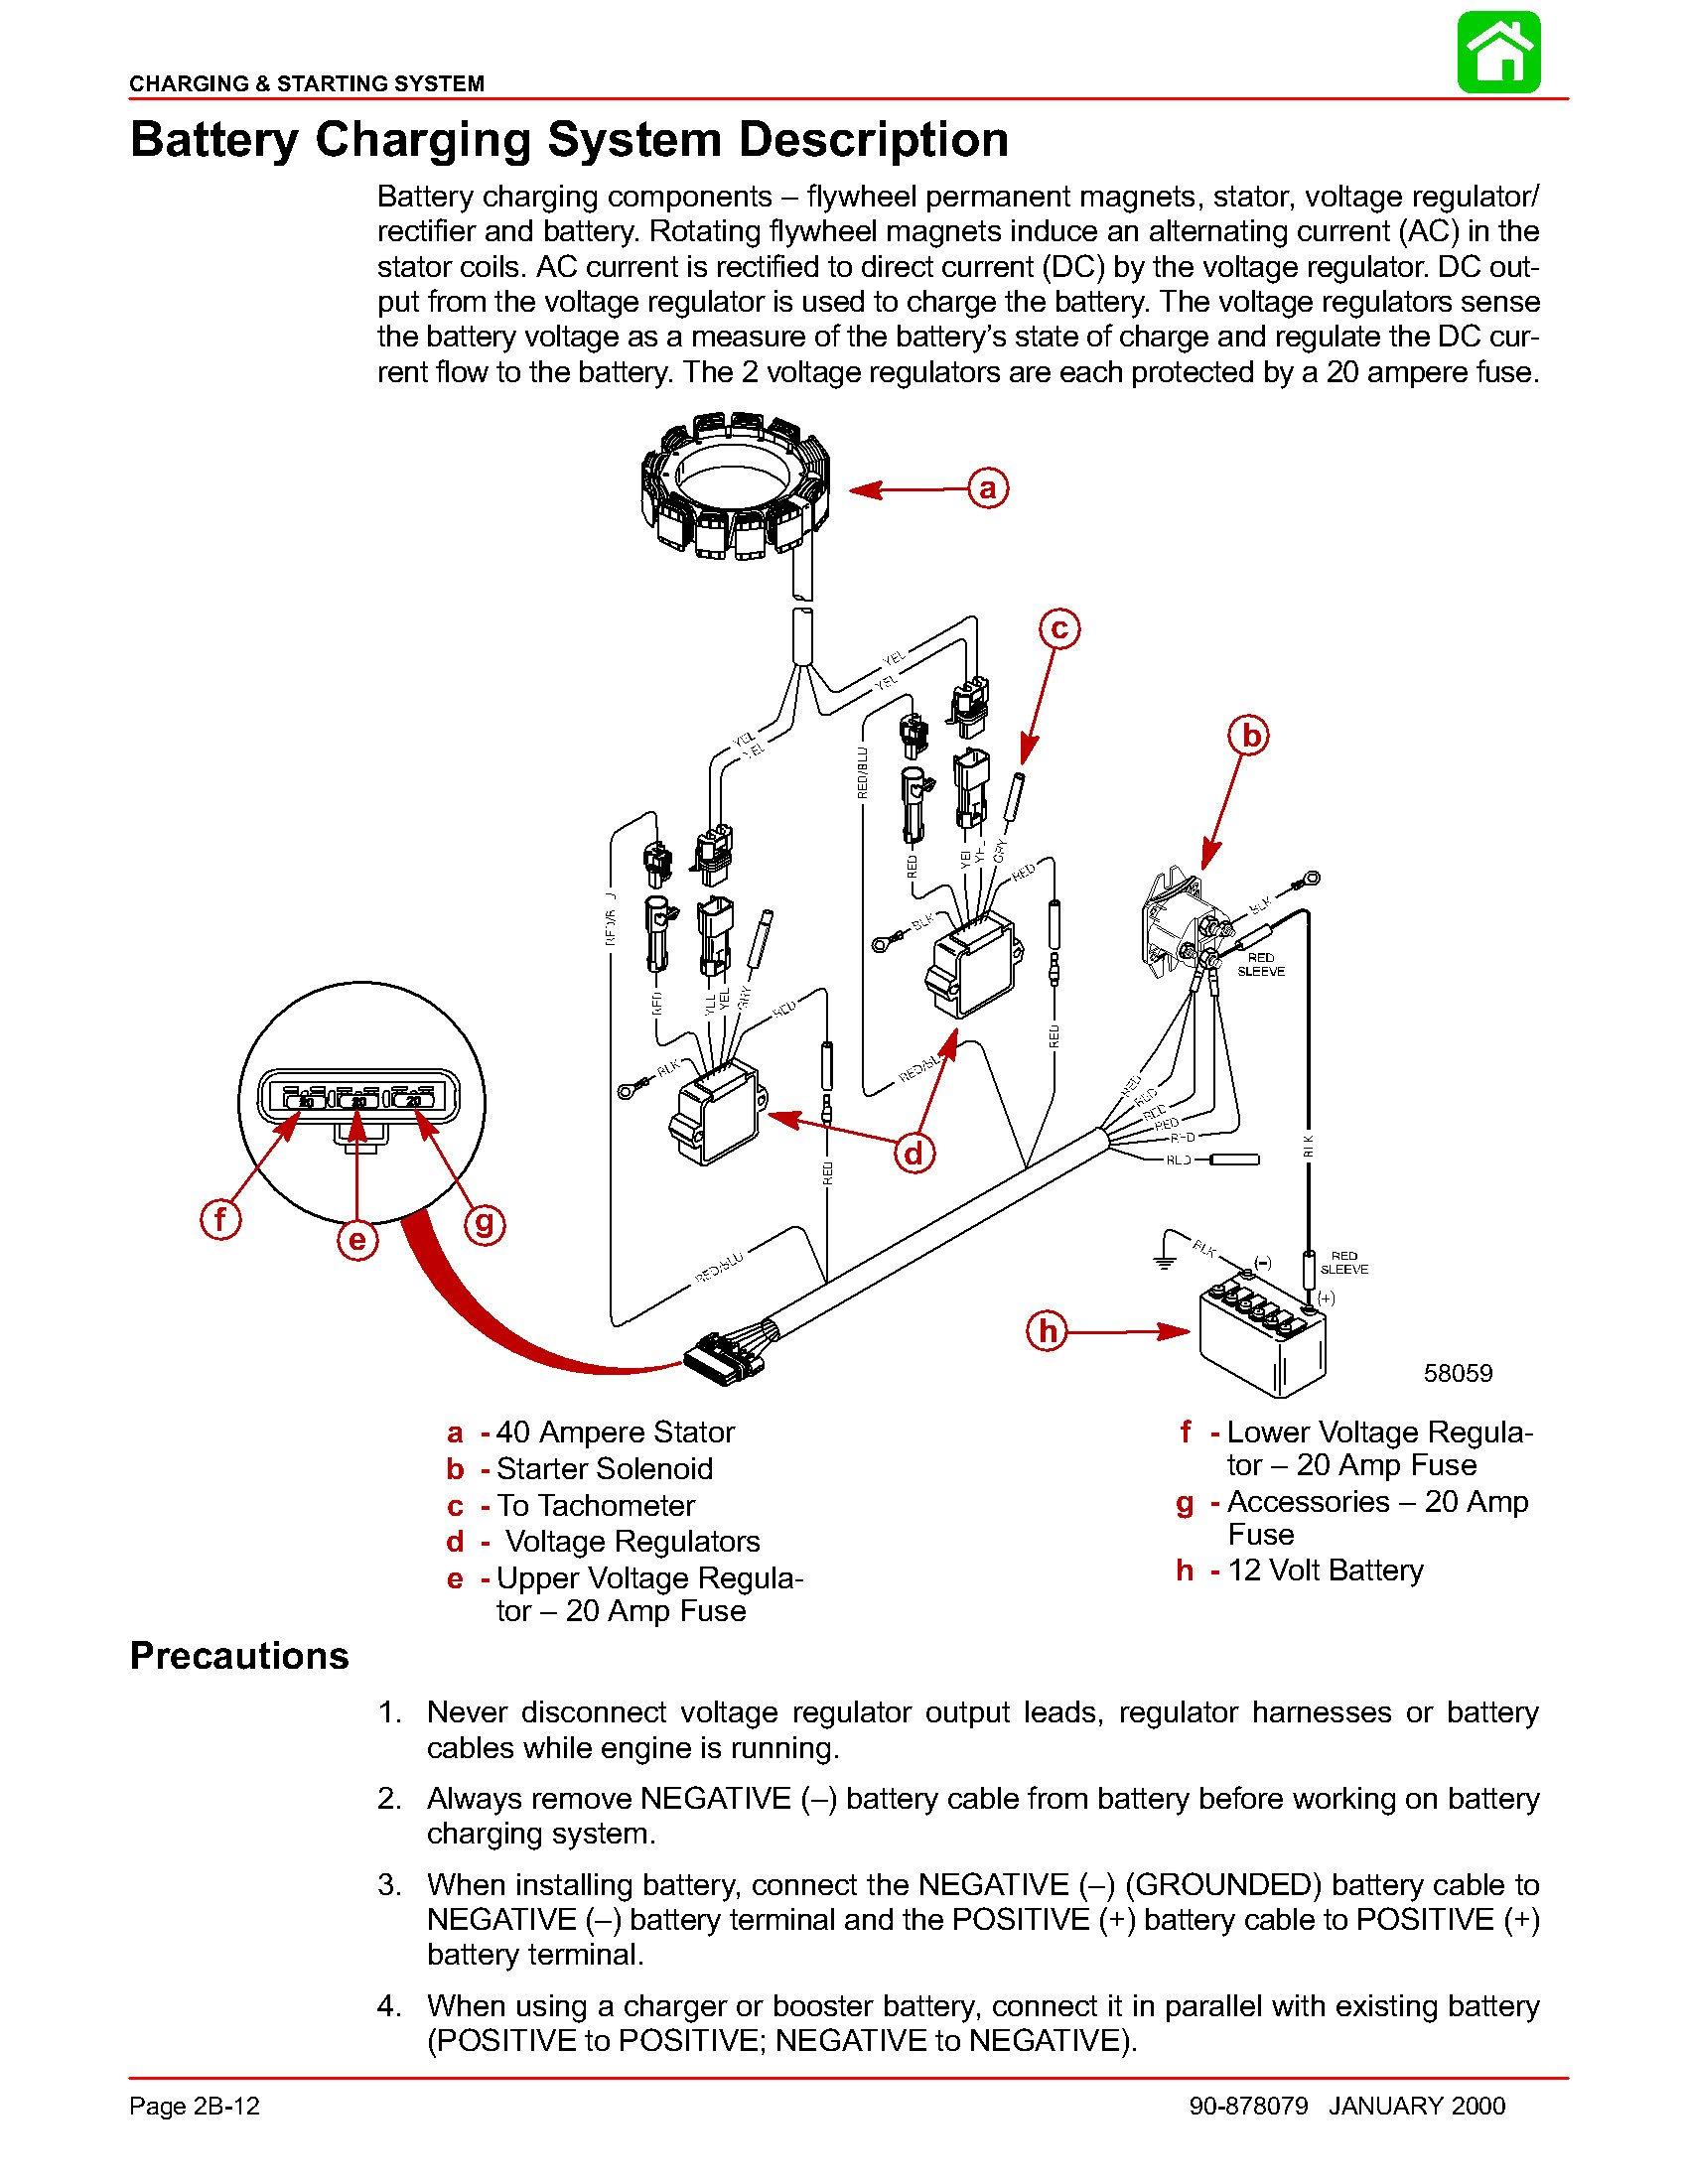 2012 12 29_150510_1 1993 mercury topaz fuse box wiring diagrams where is the fuse box on 92 mercury topaz at bayanpartner.co